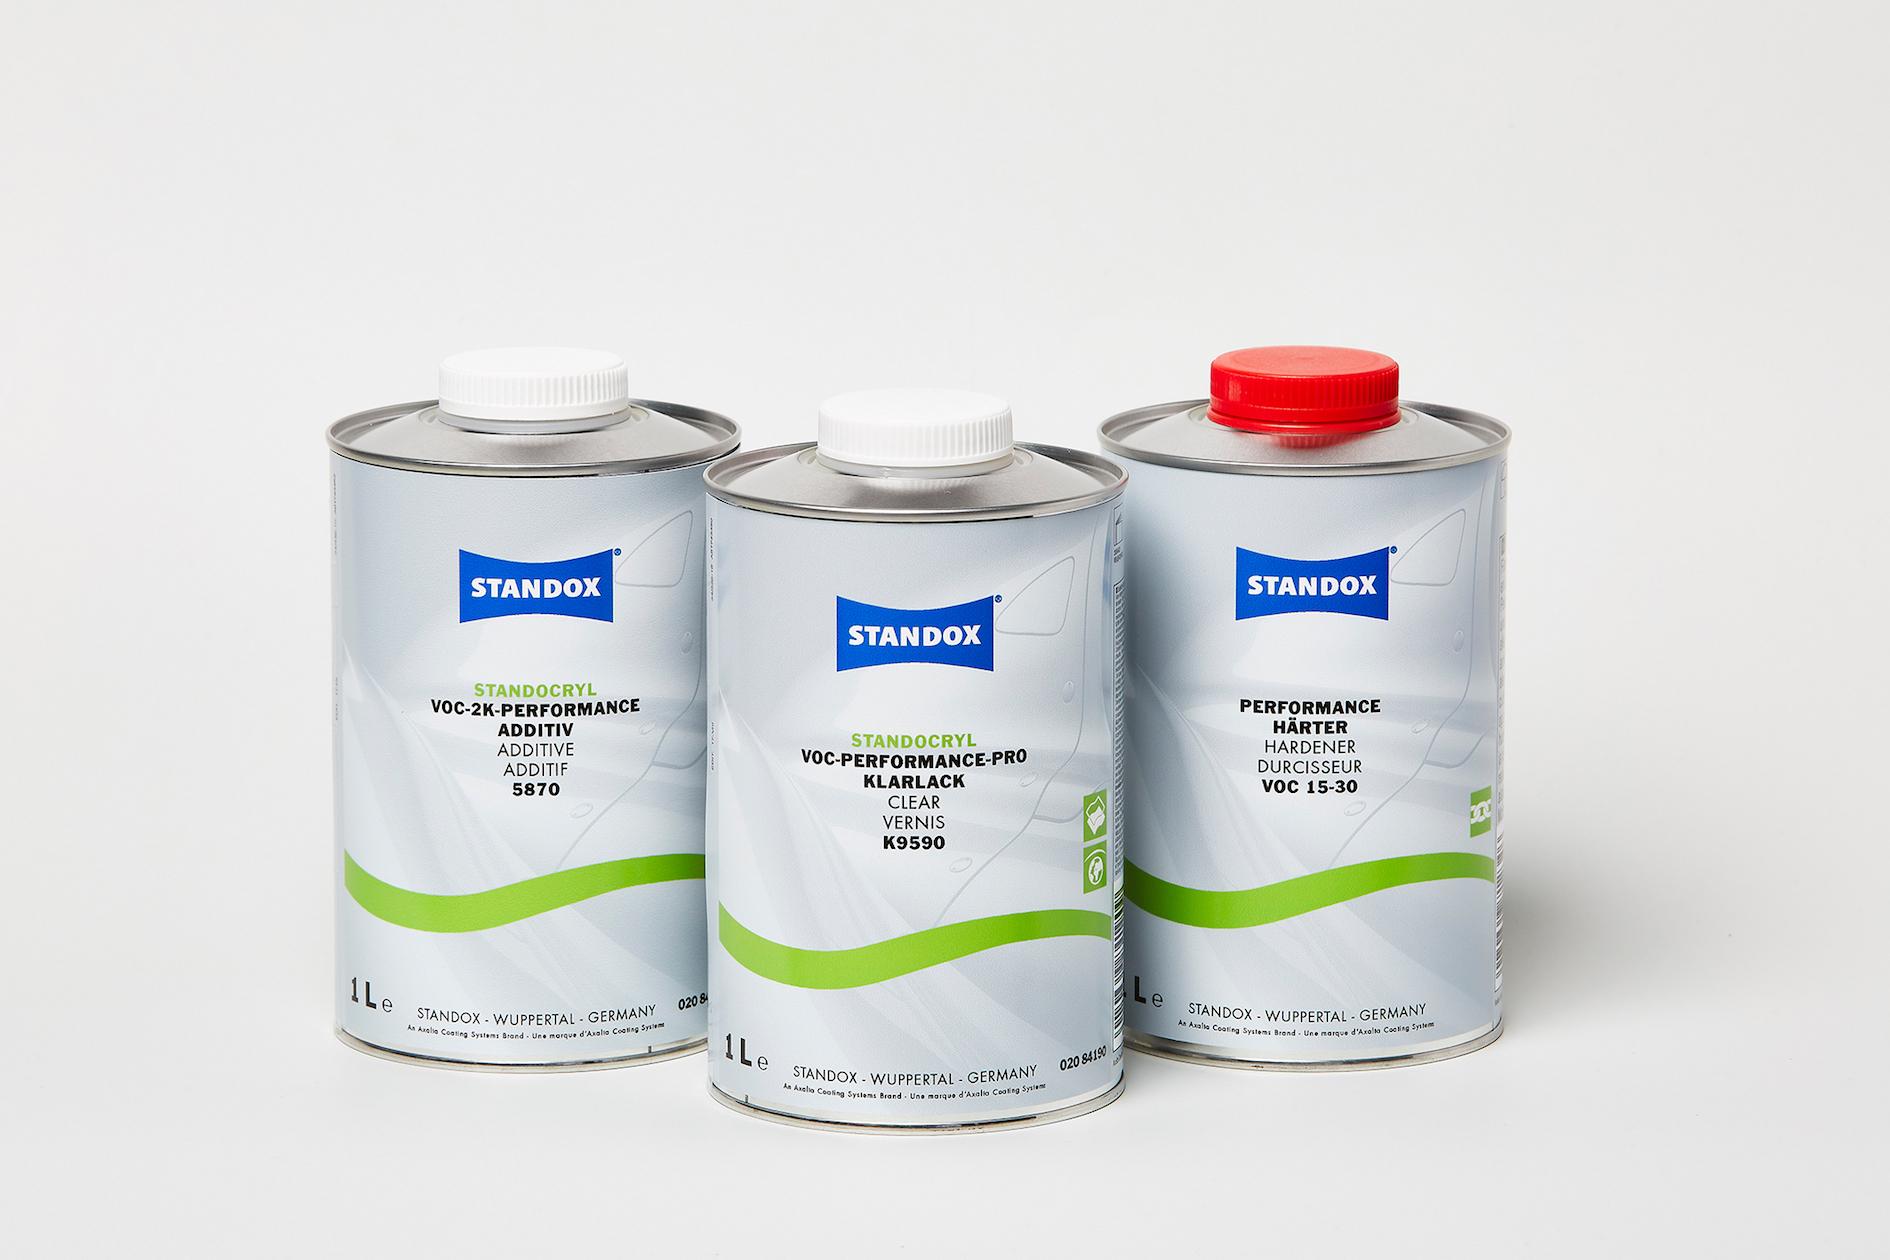 sx-standocryl-voc-performance-pro-clear-k9590-3